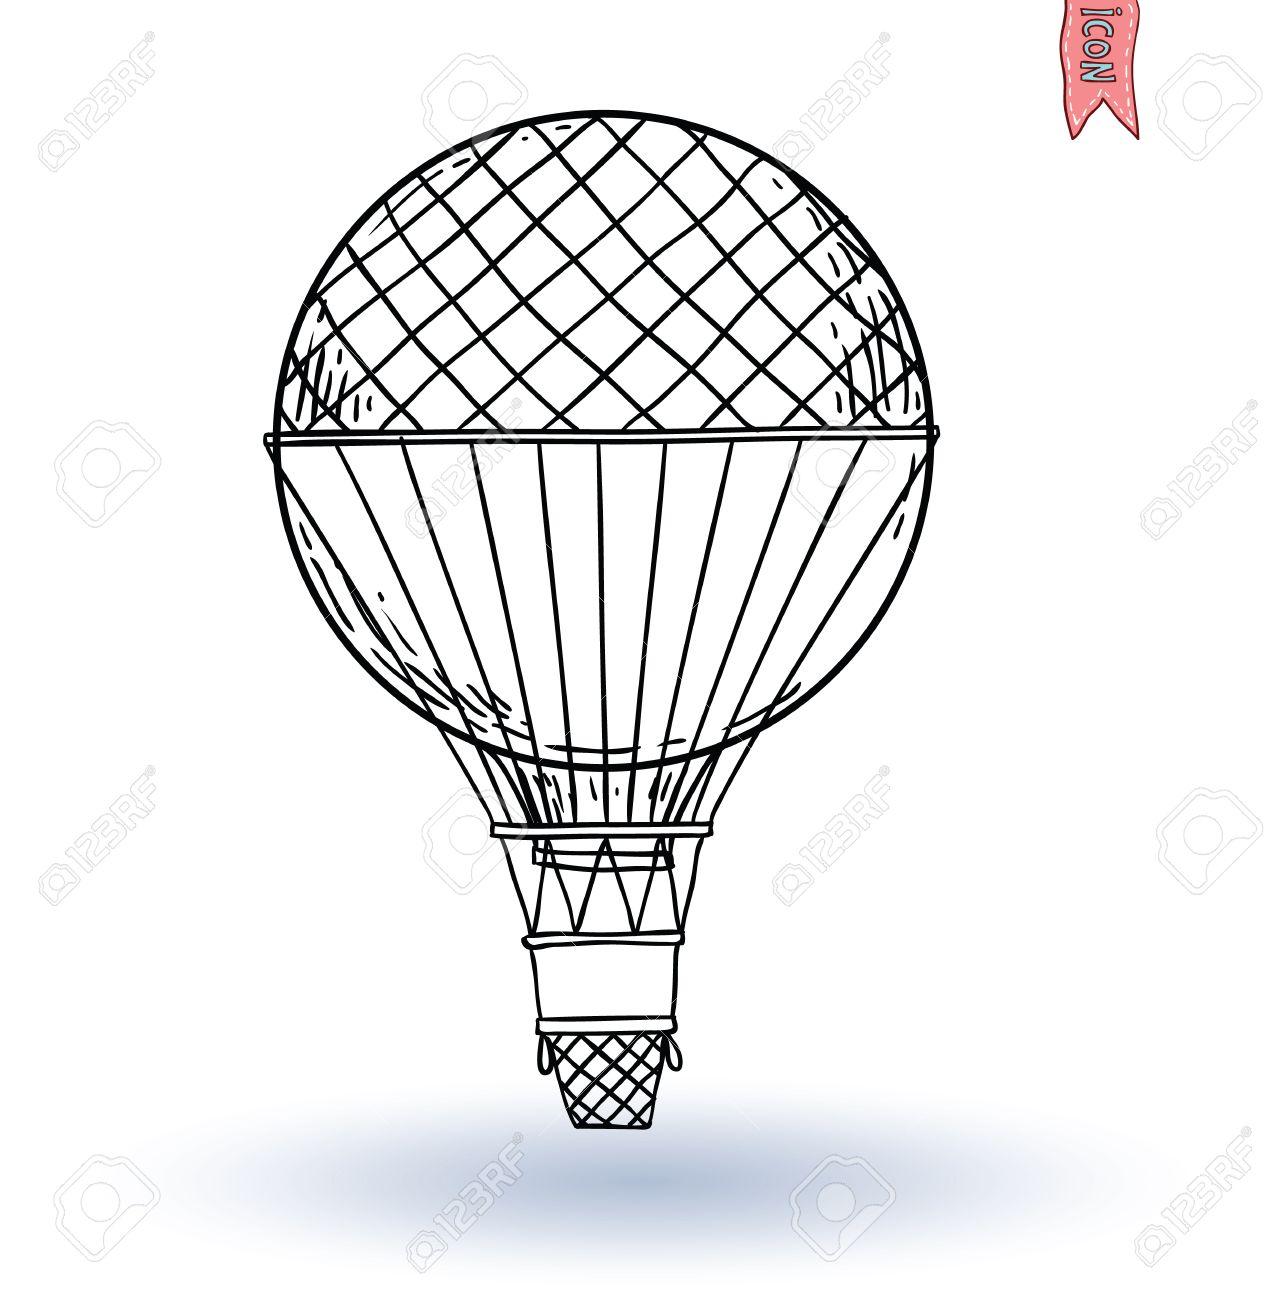 1287x1300 Steampunk Vintage Hot Air Balloon, Hand Drawn Vector Illustration